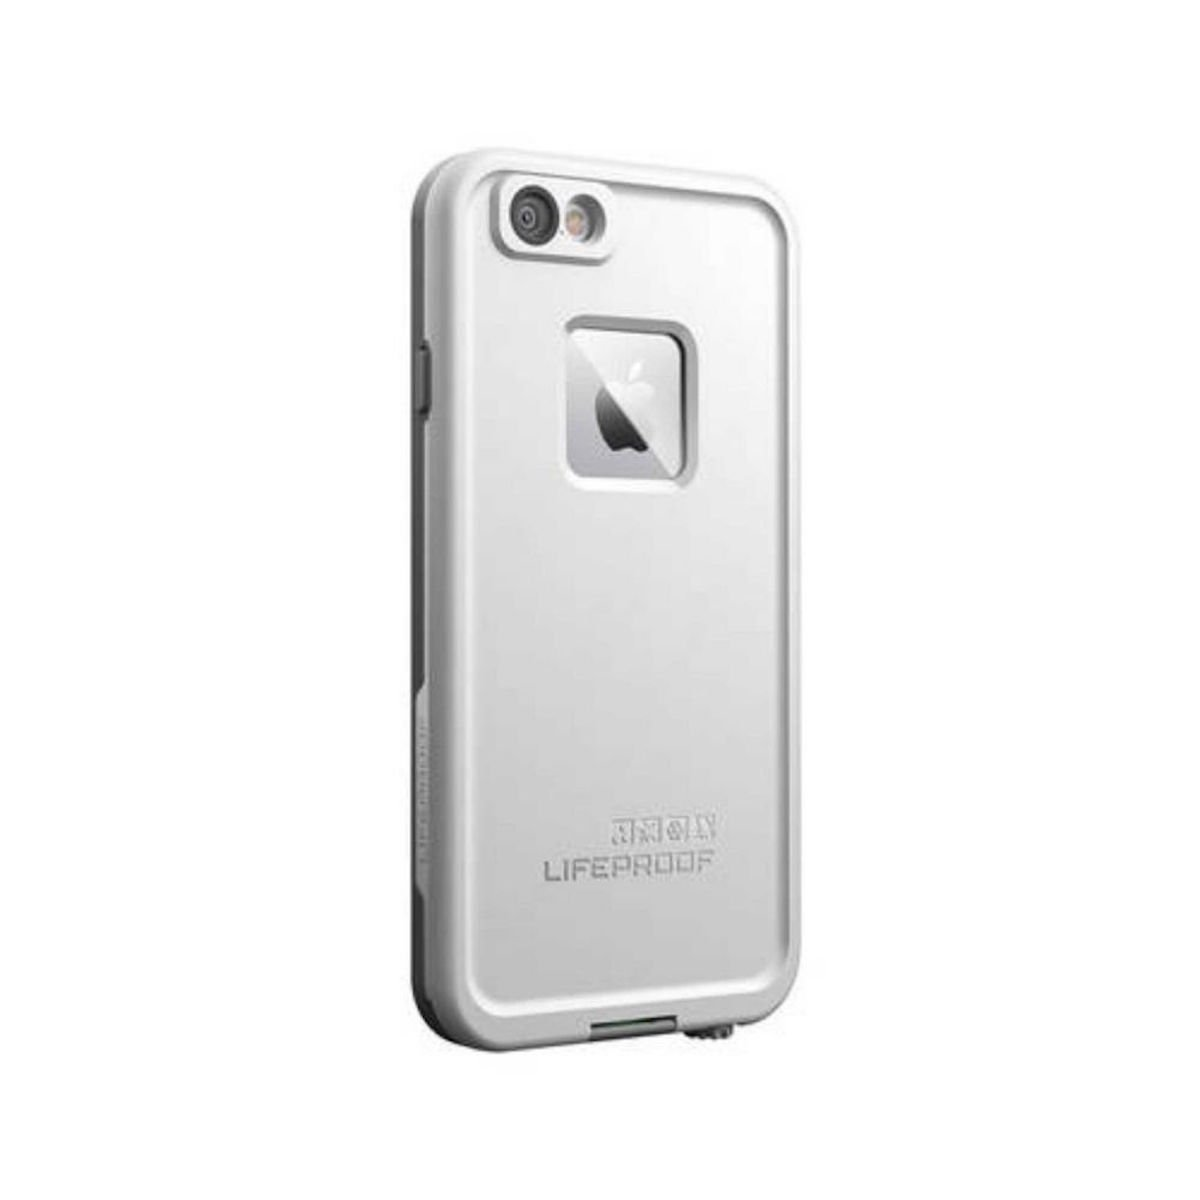 Funda lifeproof fre iphone 6s plus 77 52559 blanco sears com mx me entiende - Fundas lifeproof ...